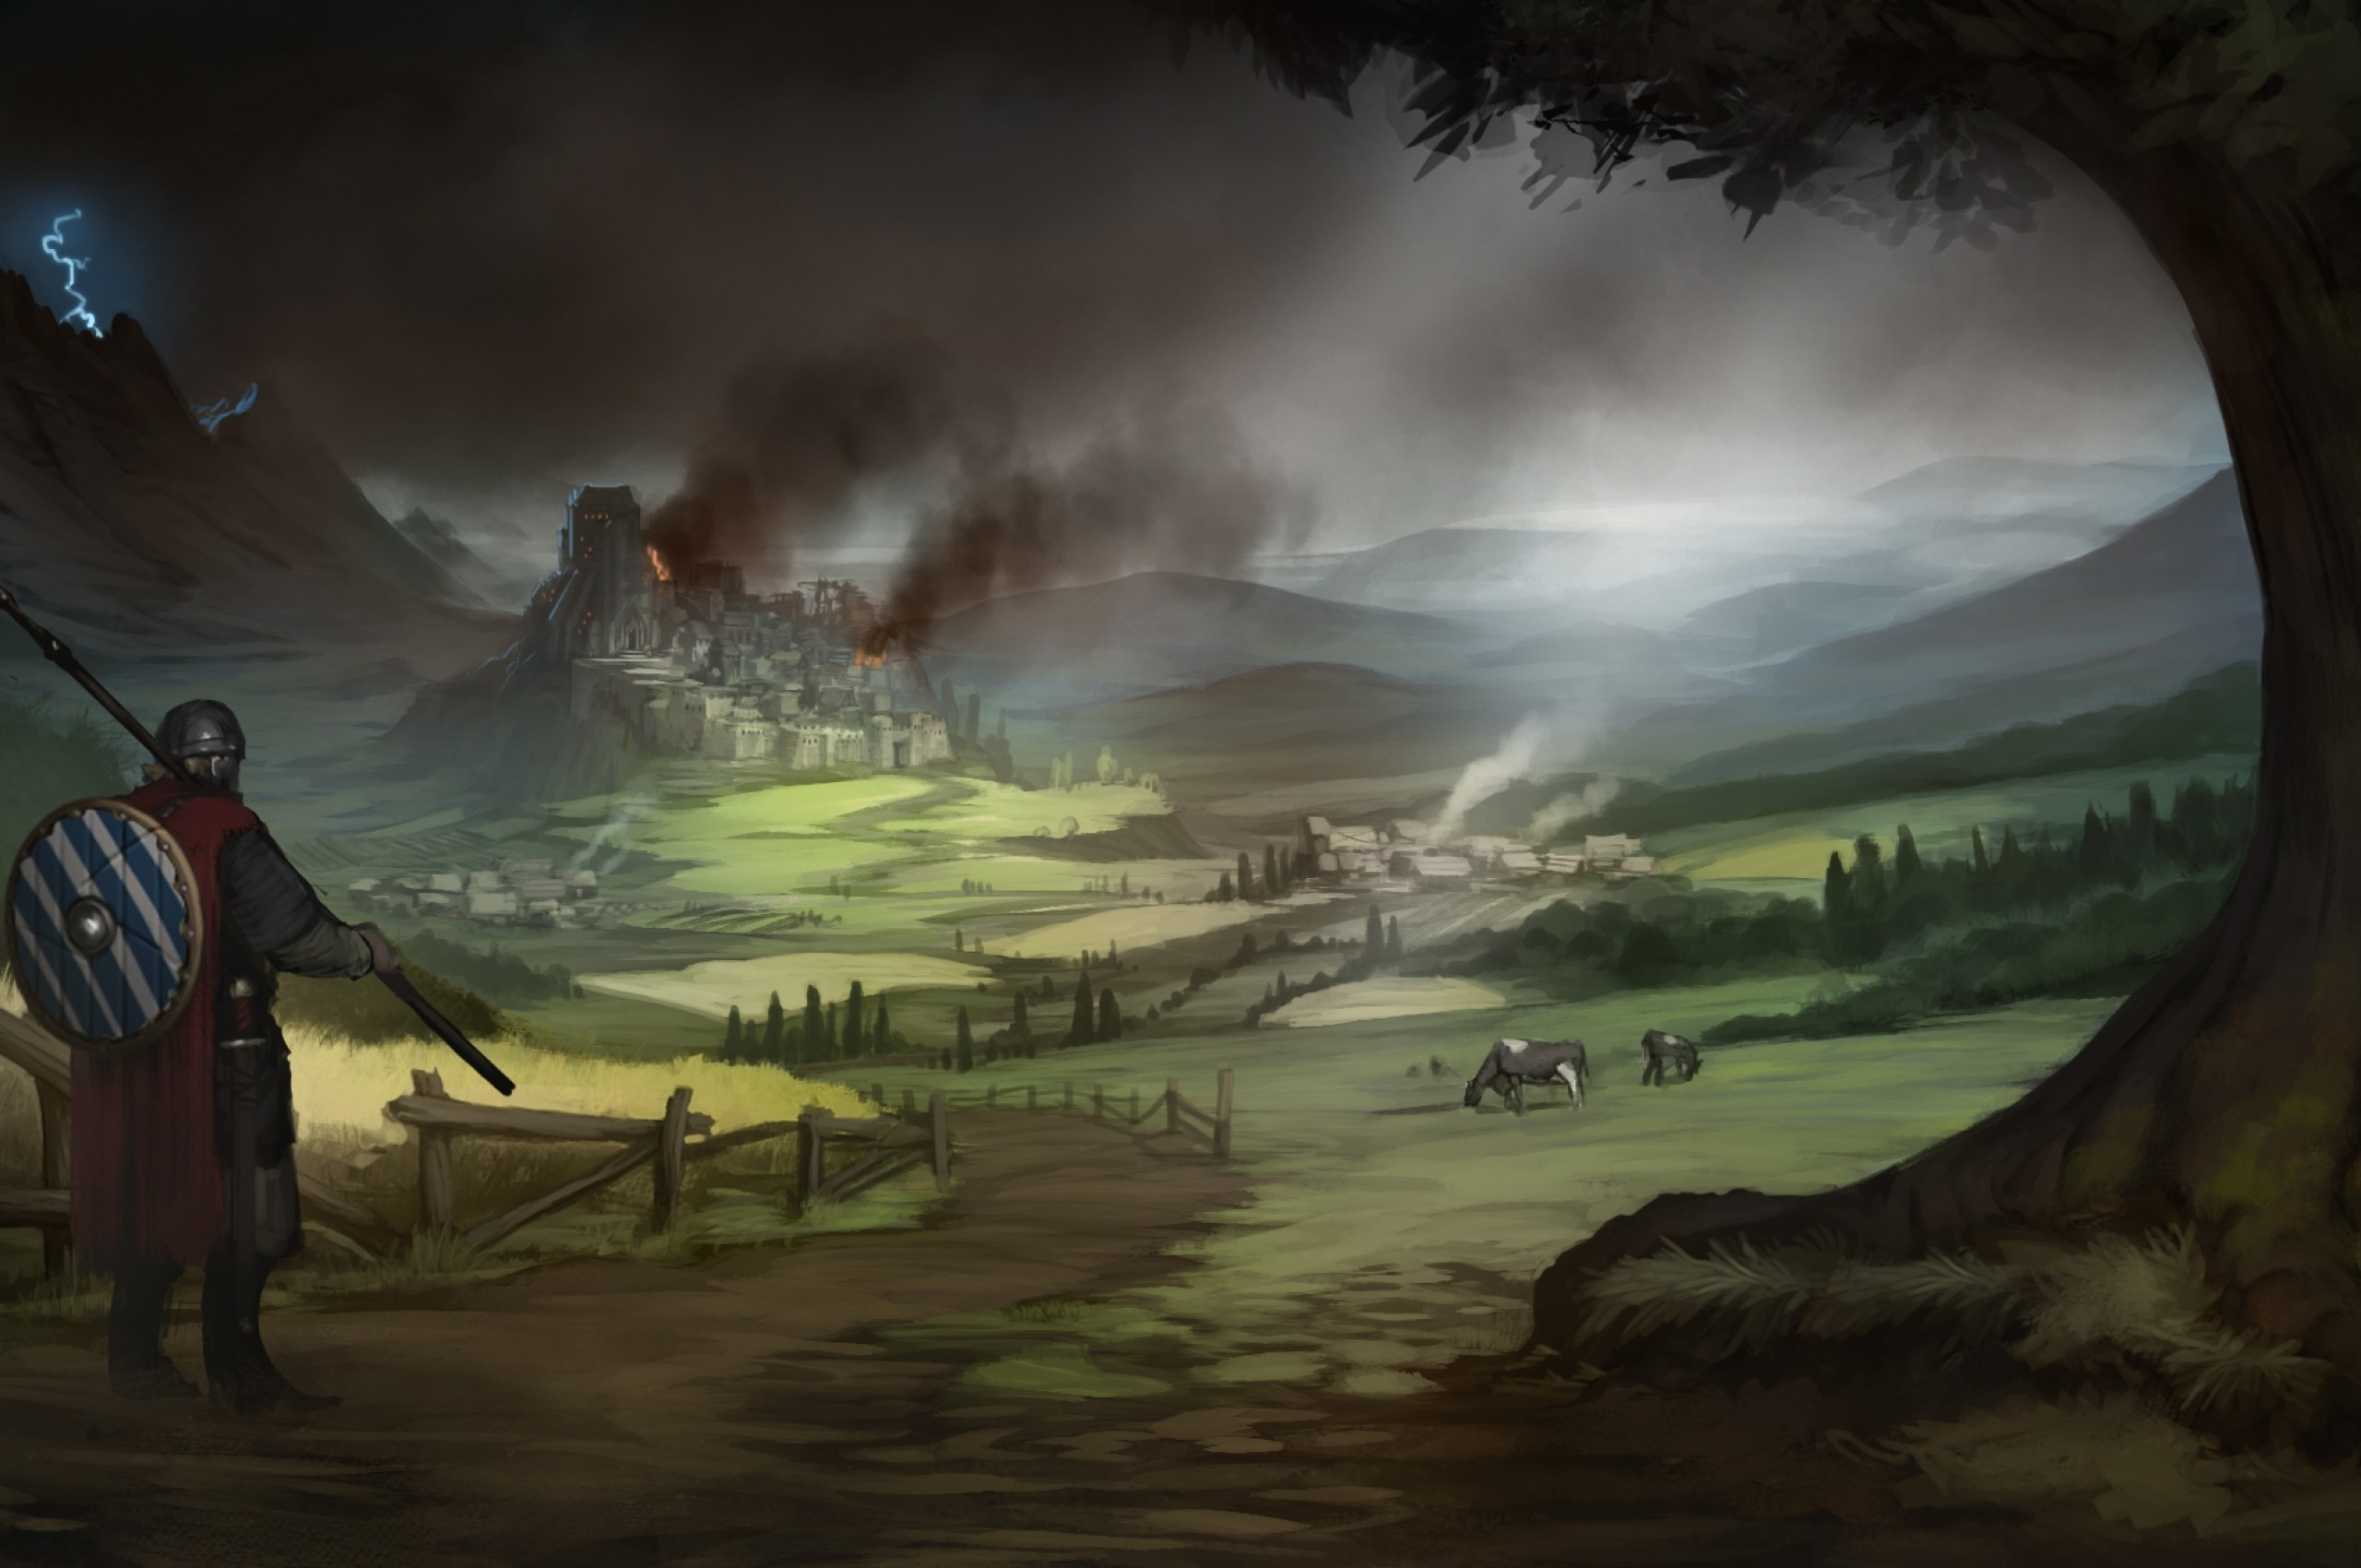 Res: 2560x1700, Castle, Knight, Animals, Fire, Shield, Fantasy World